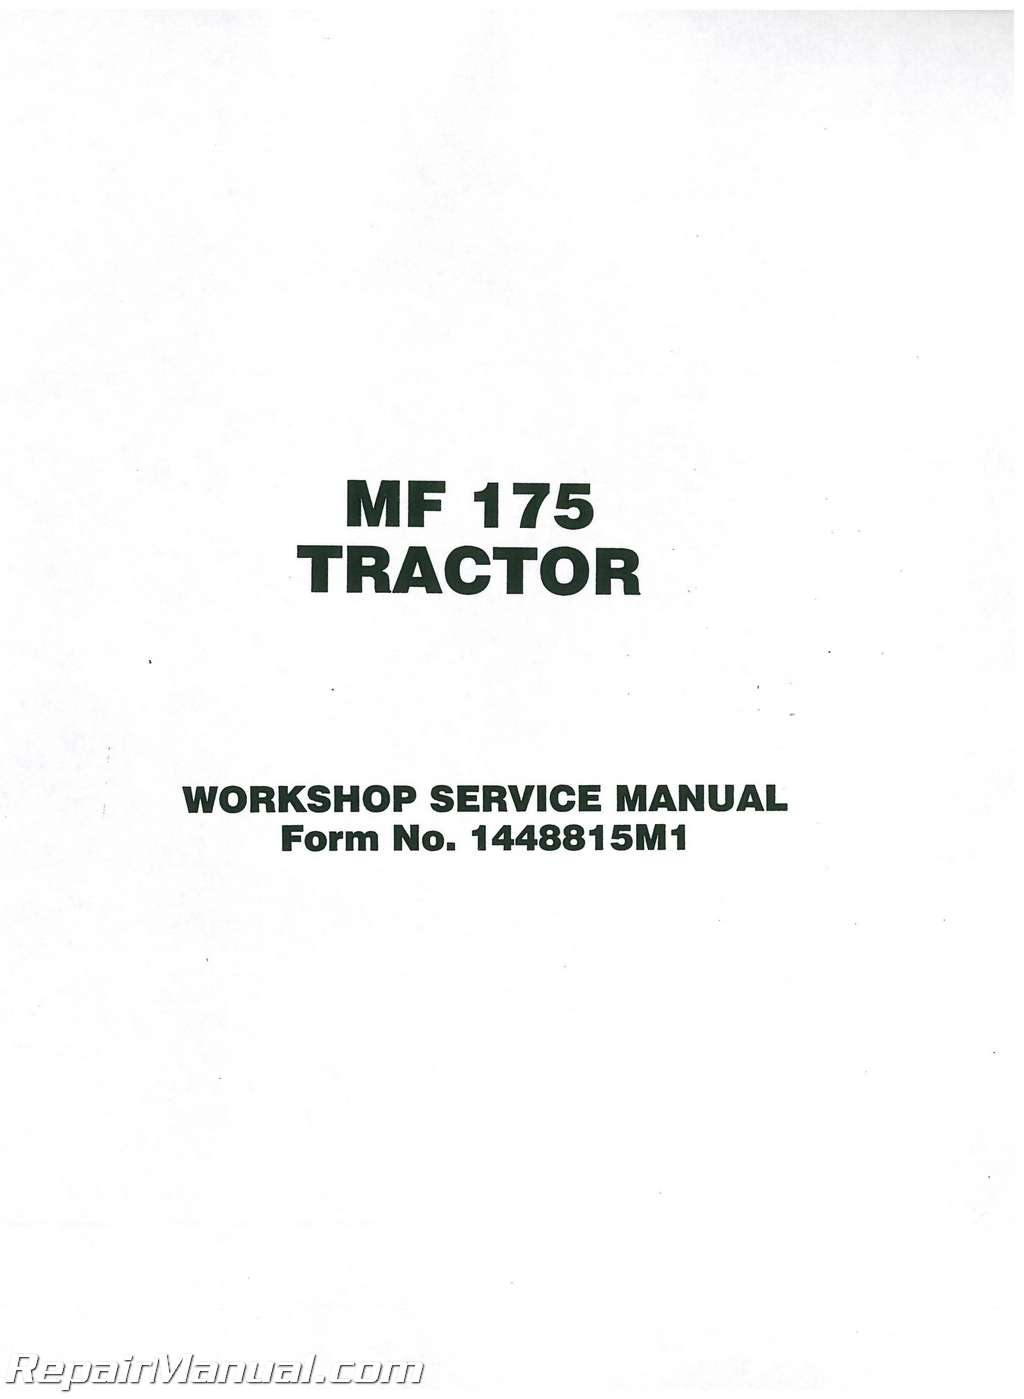 massey ferguson mf175 mf282 service manual rh repairmanual com massey ferguson 175 repair manual pdf massey ferguson 175 repair manual pdf